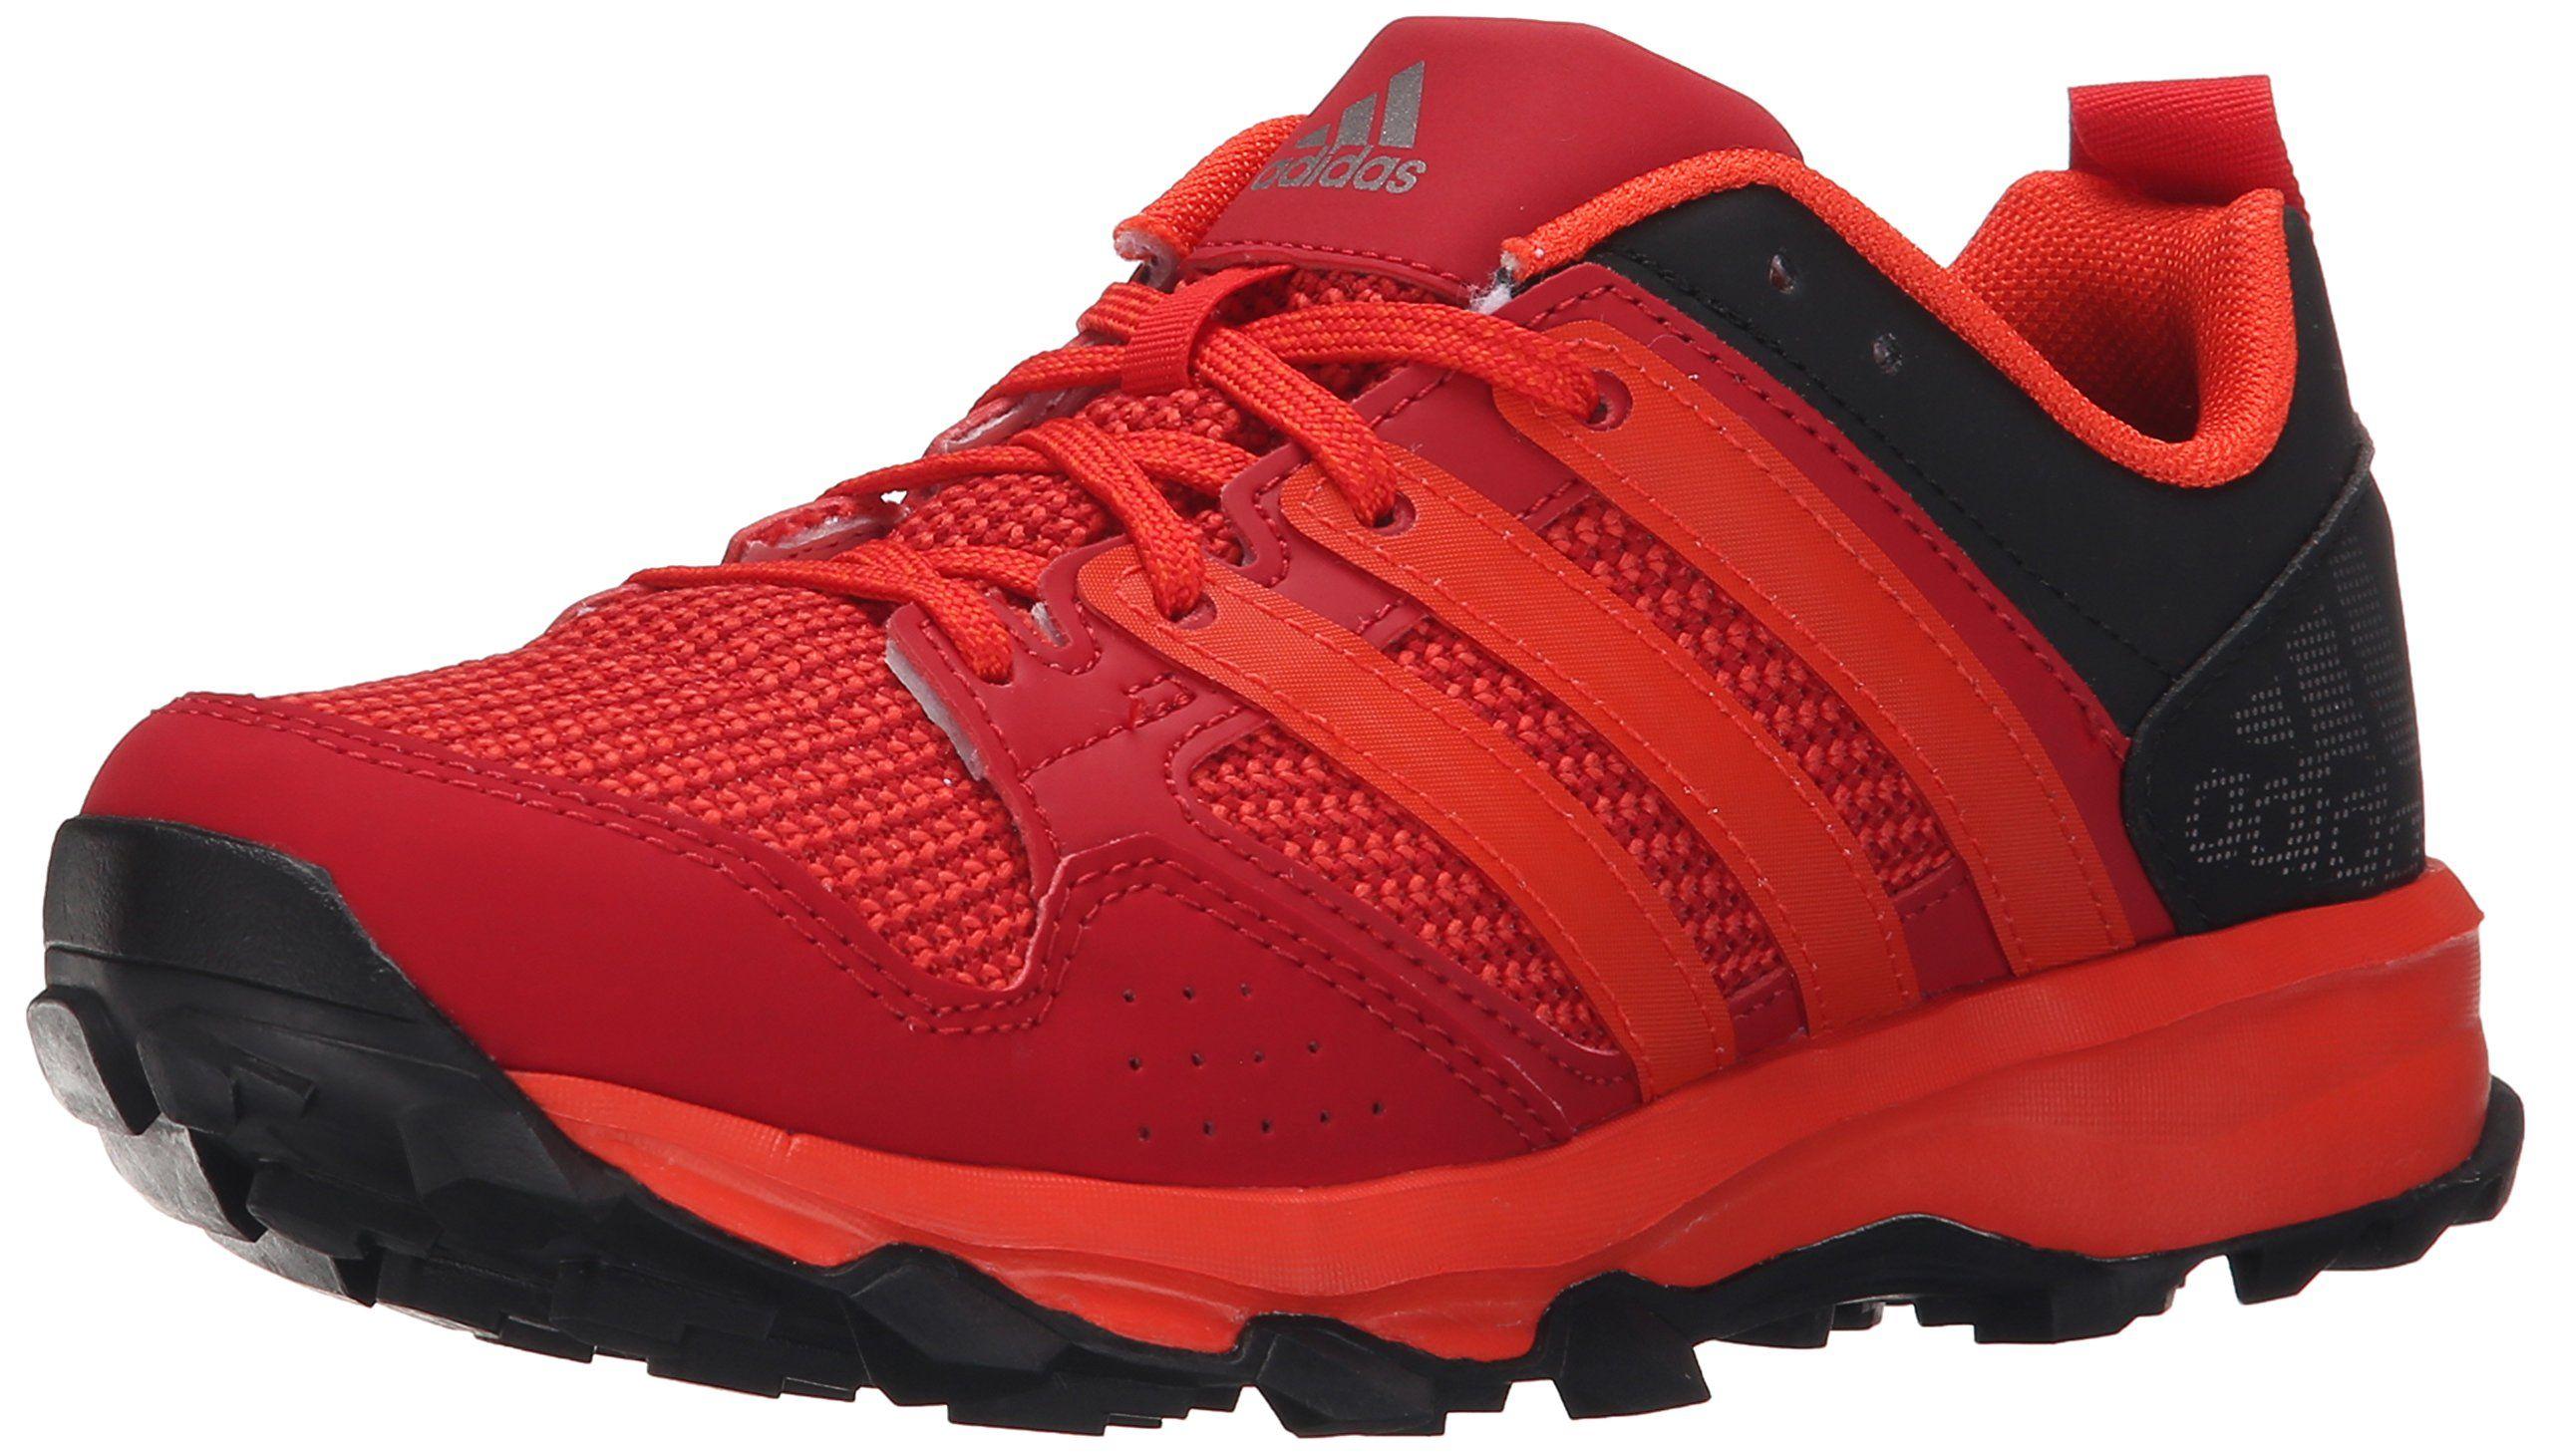 quality design b8a87 d7f2a adidas Performance Kanadia 7 TR K Trail Running Shoe ,Power  Red Orange Vivid Red,11.5 M US Little Kid. Air mesh upper for maximum  breathability.